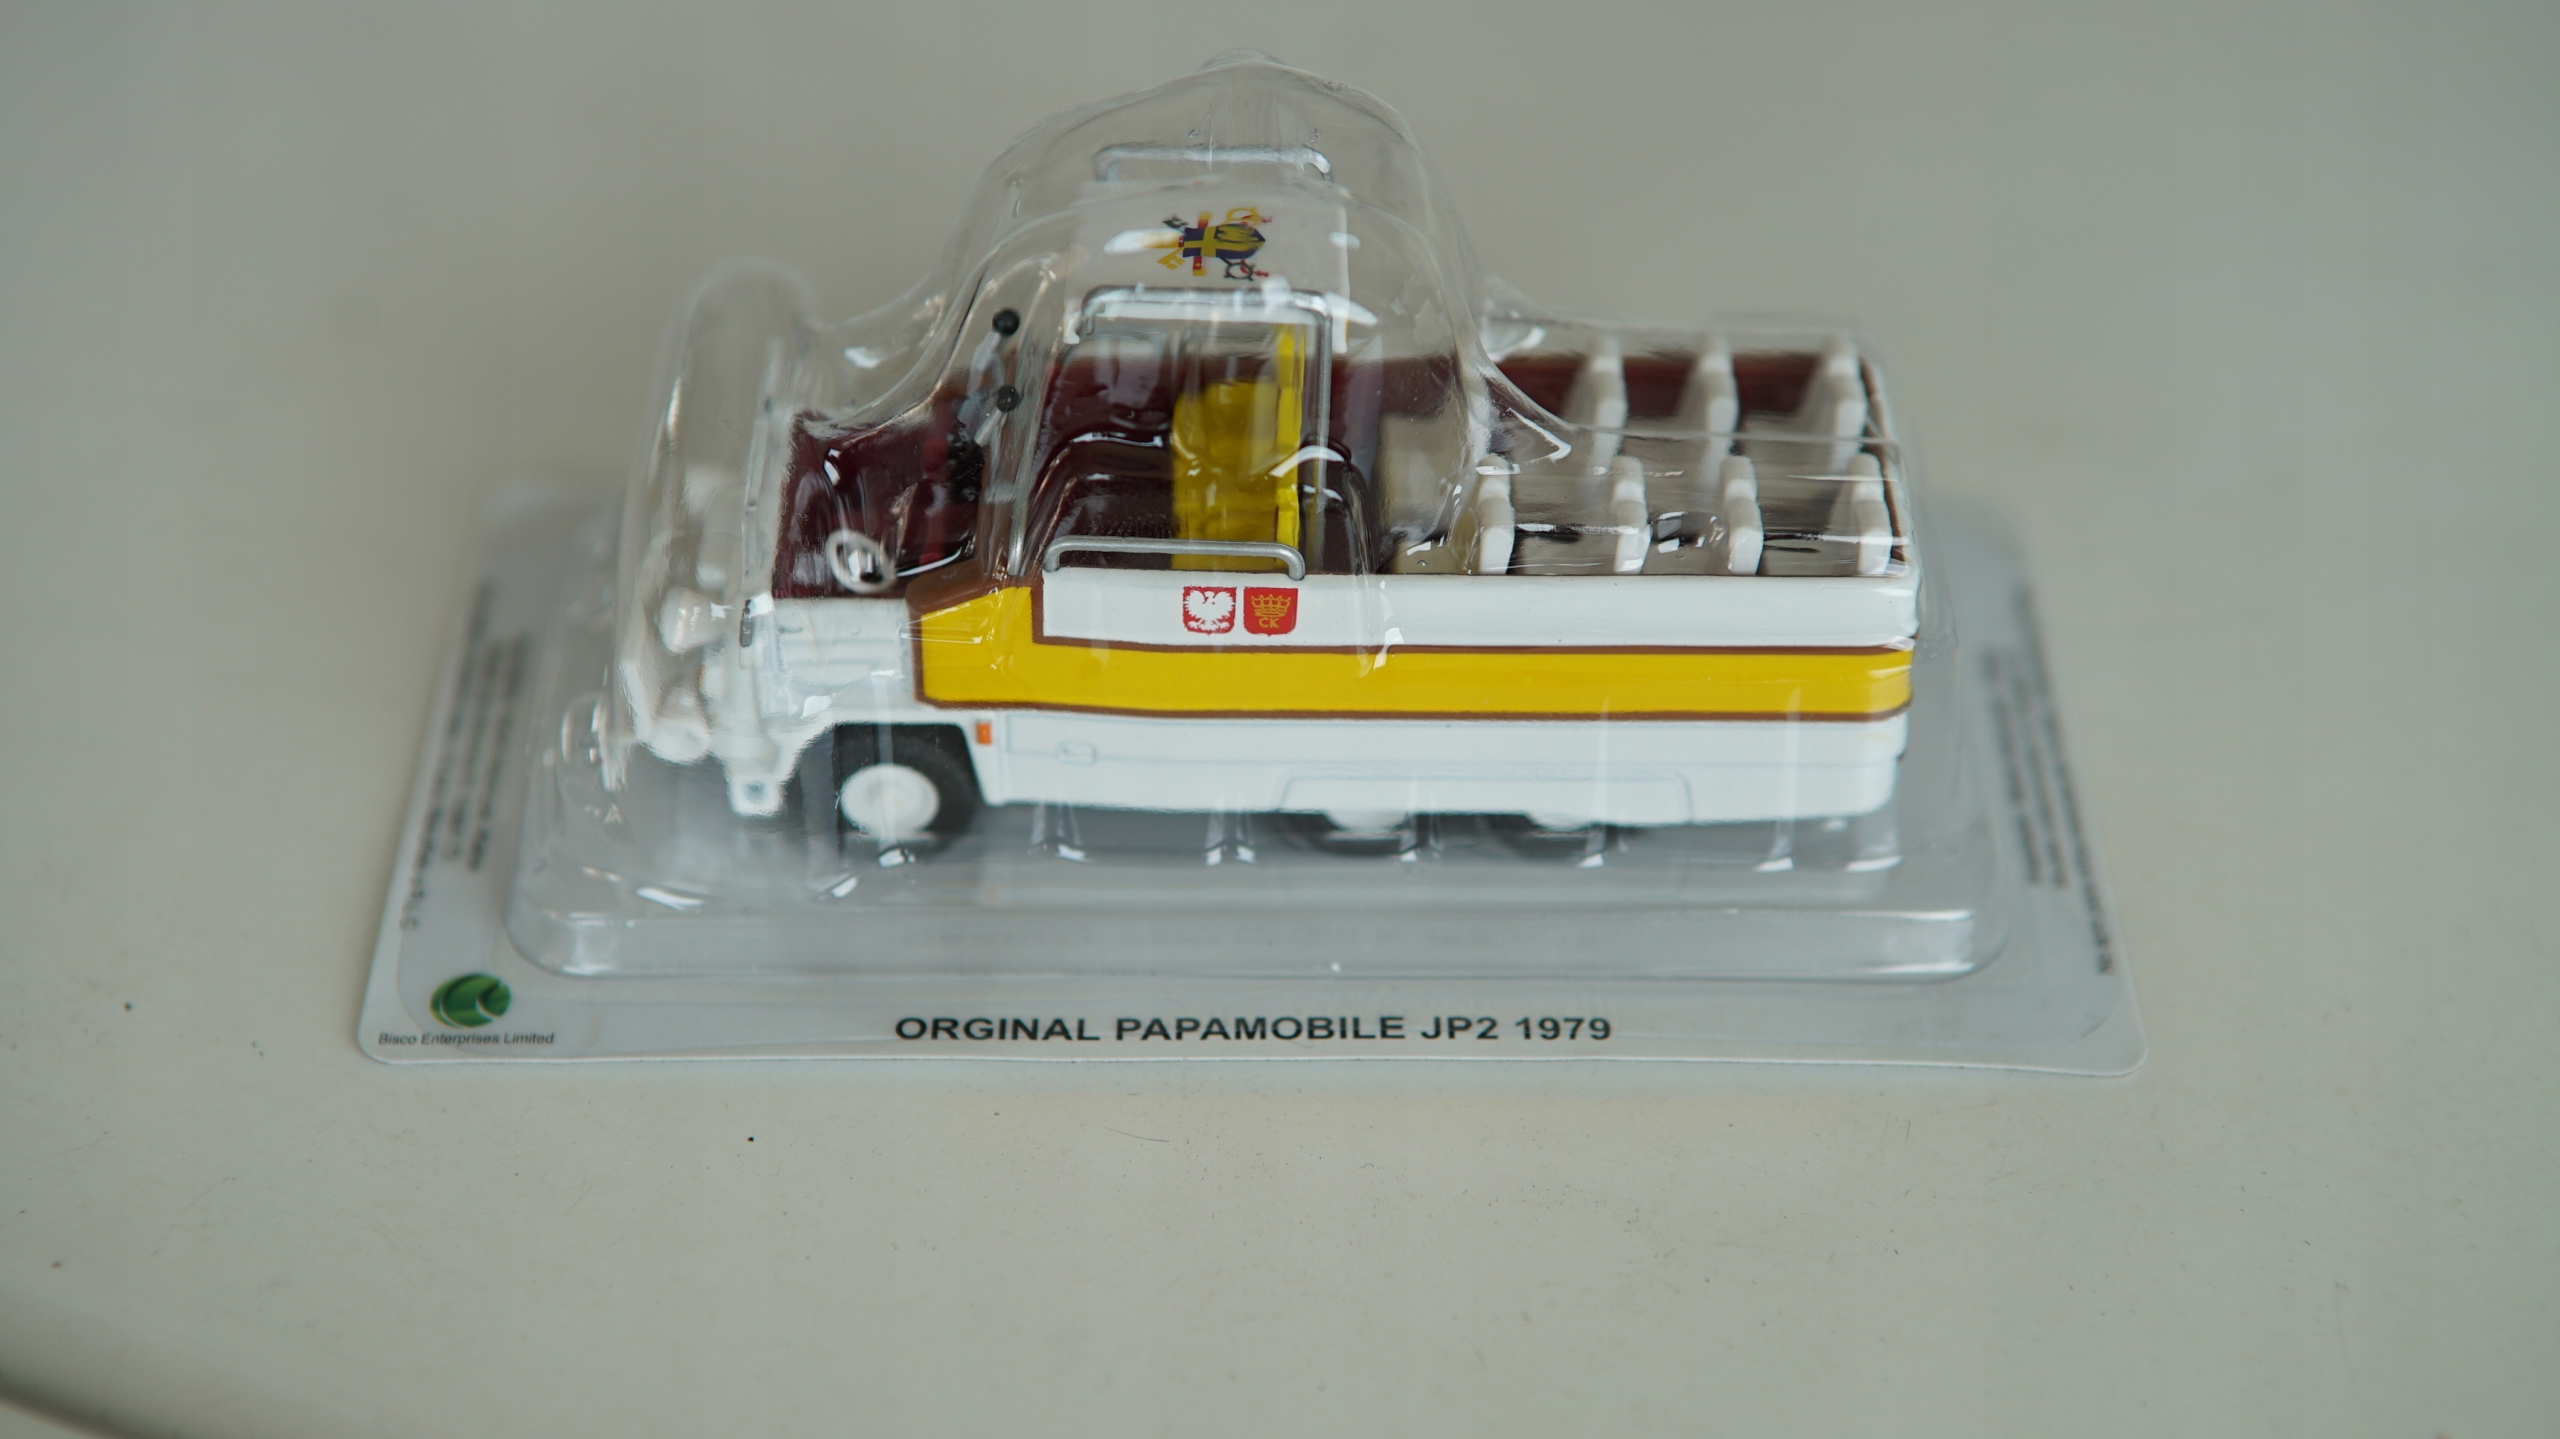 Model samochodu STAR 660 PAPAMOBILE JP2